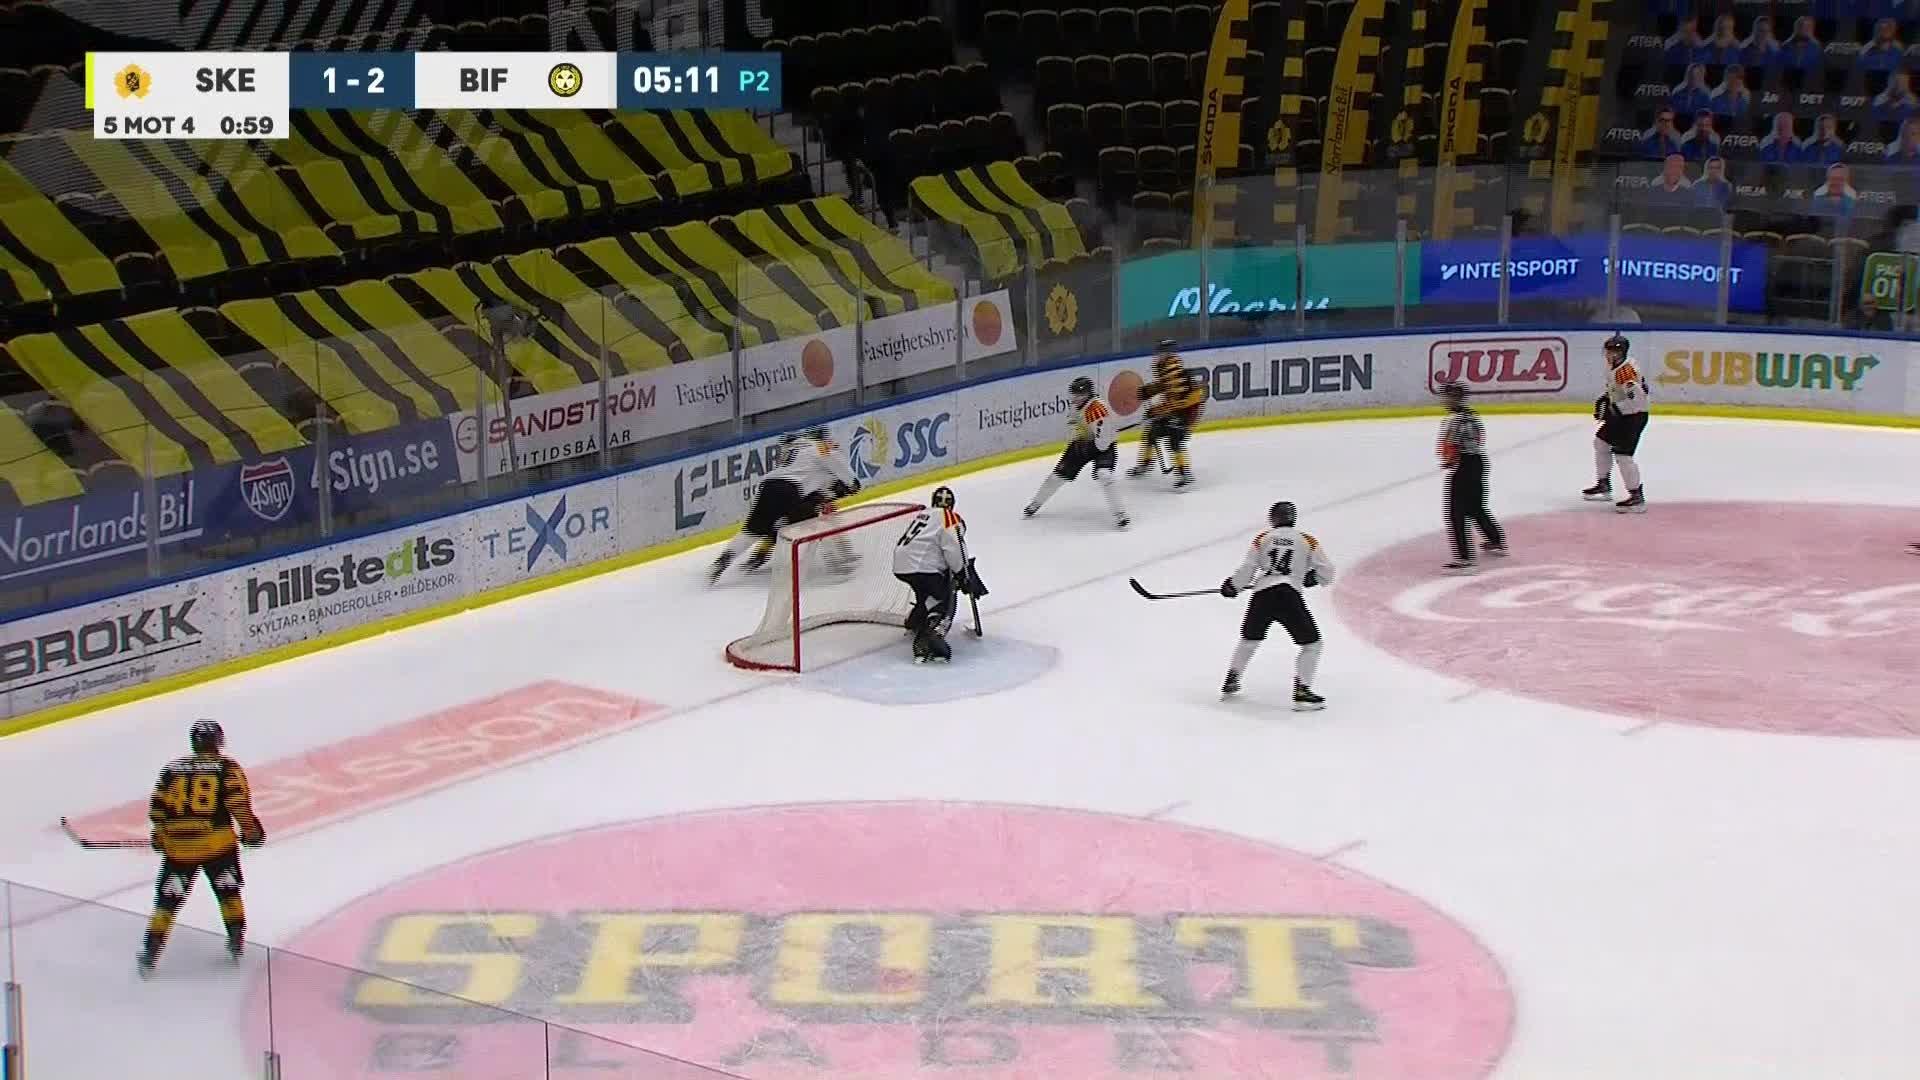 Skellefteå AIK - Brynäs IF 2-2